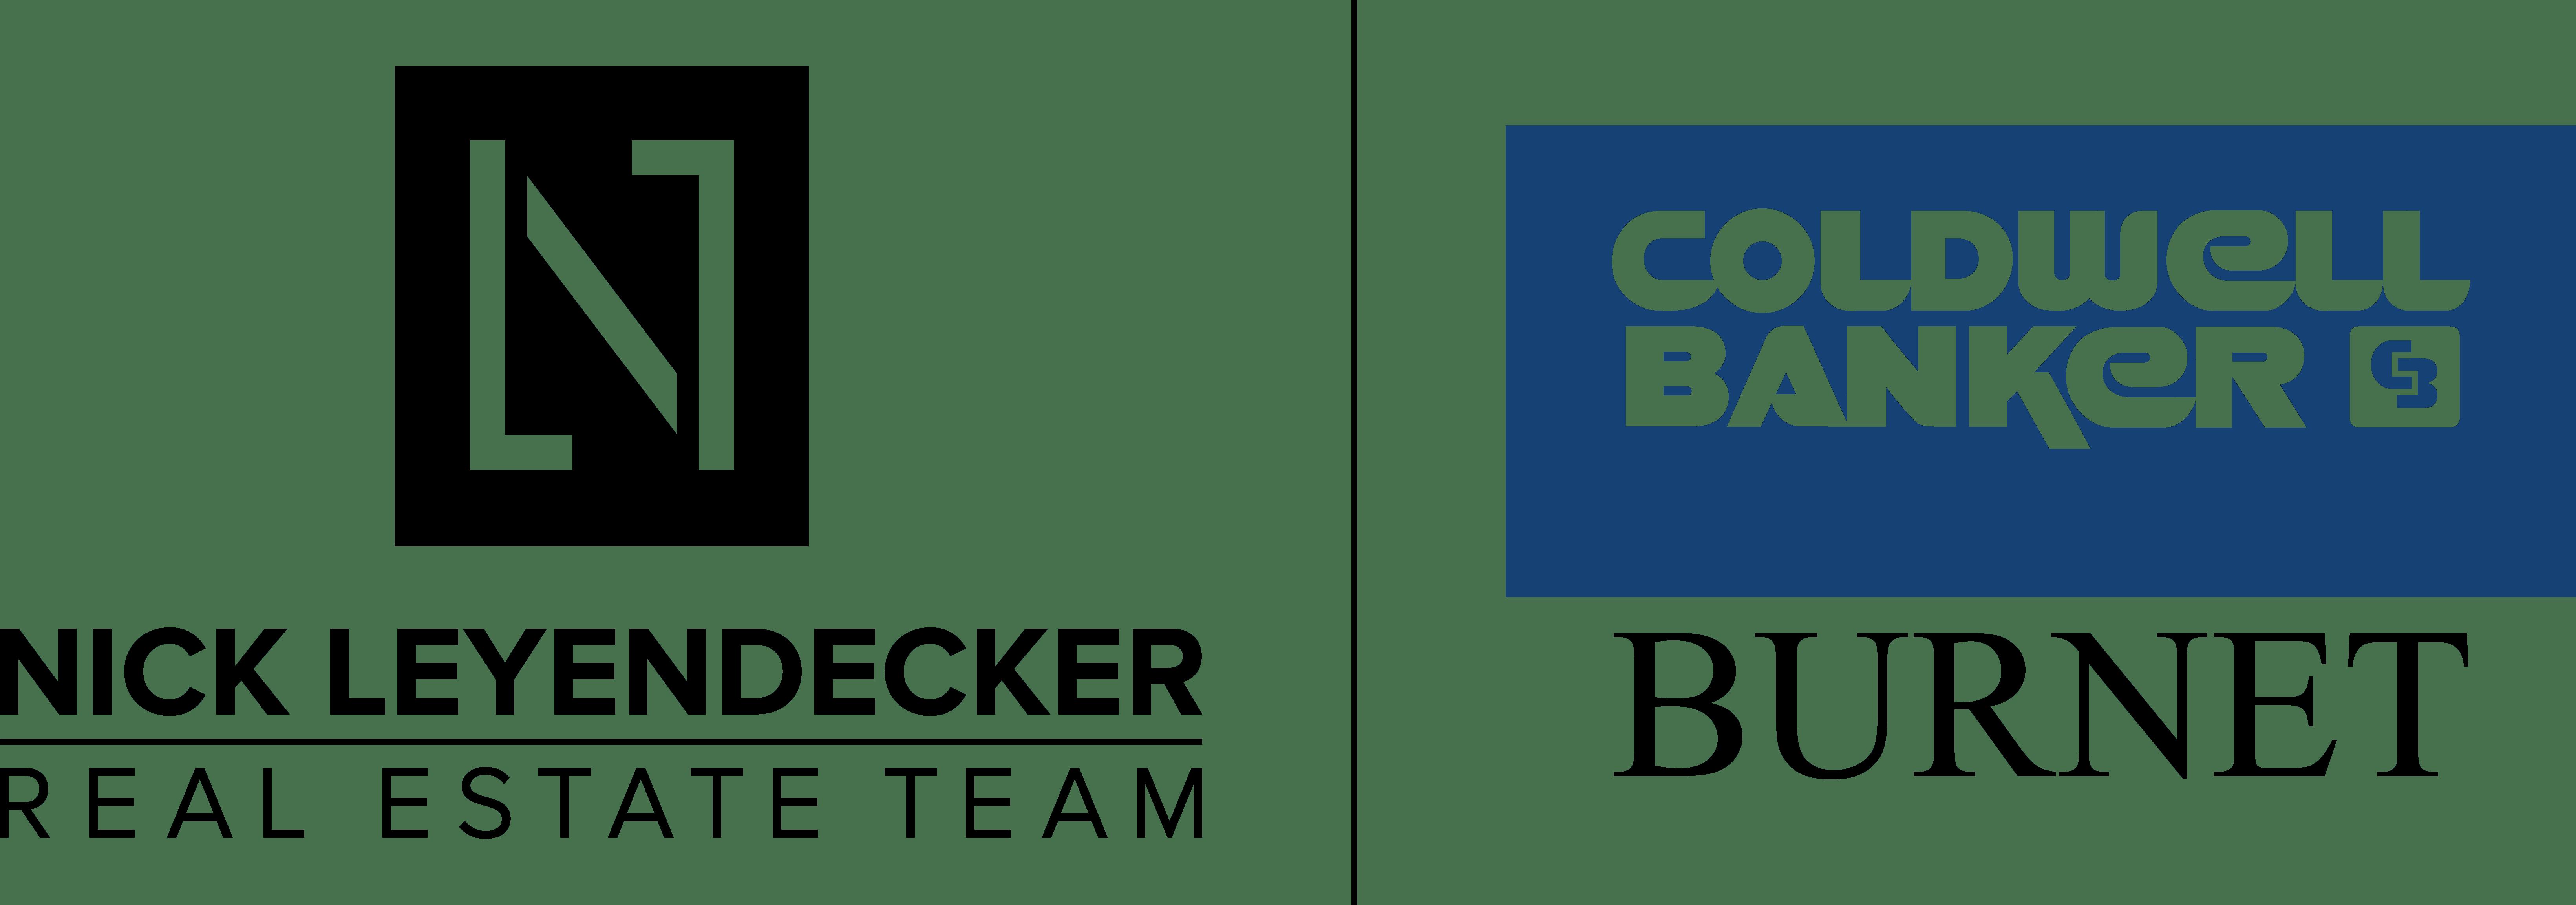 Nick Leyendecker - Real Estate Team   Coldwell Banker - Burnet